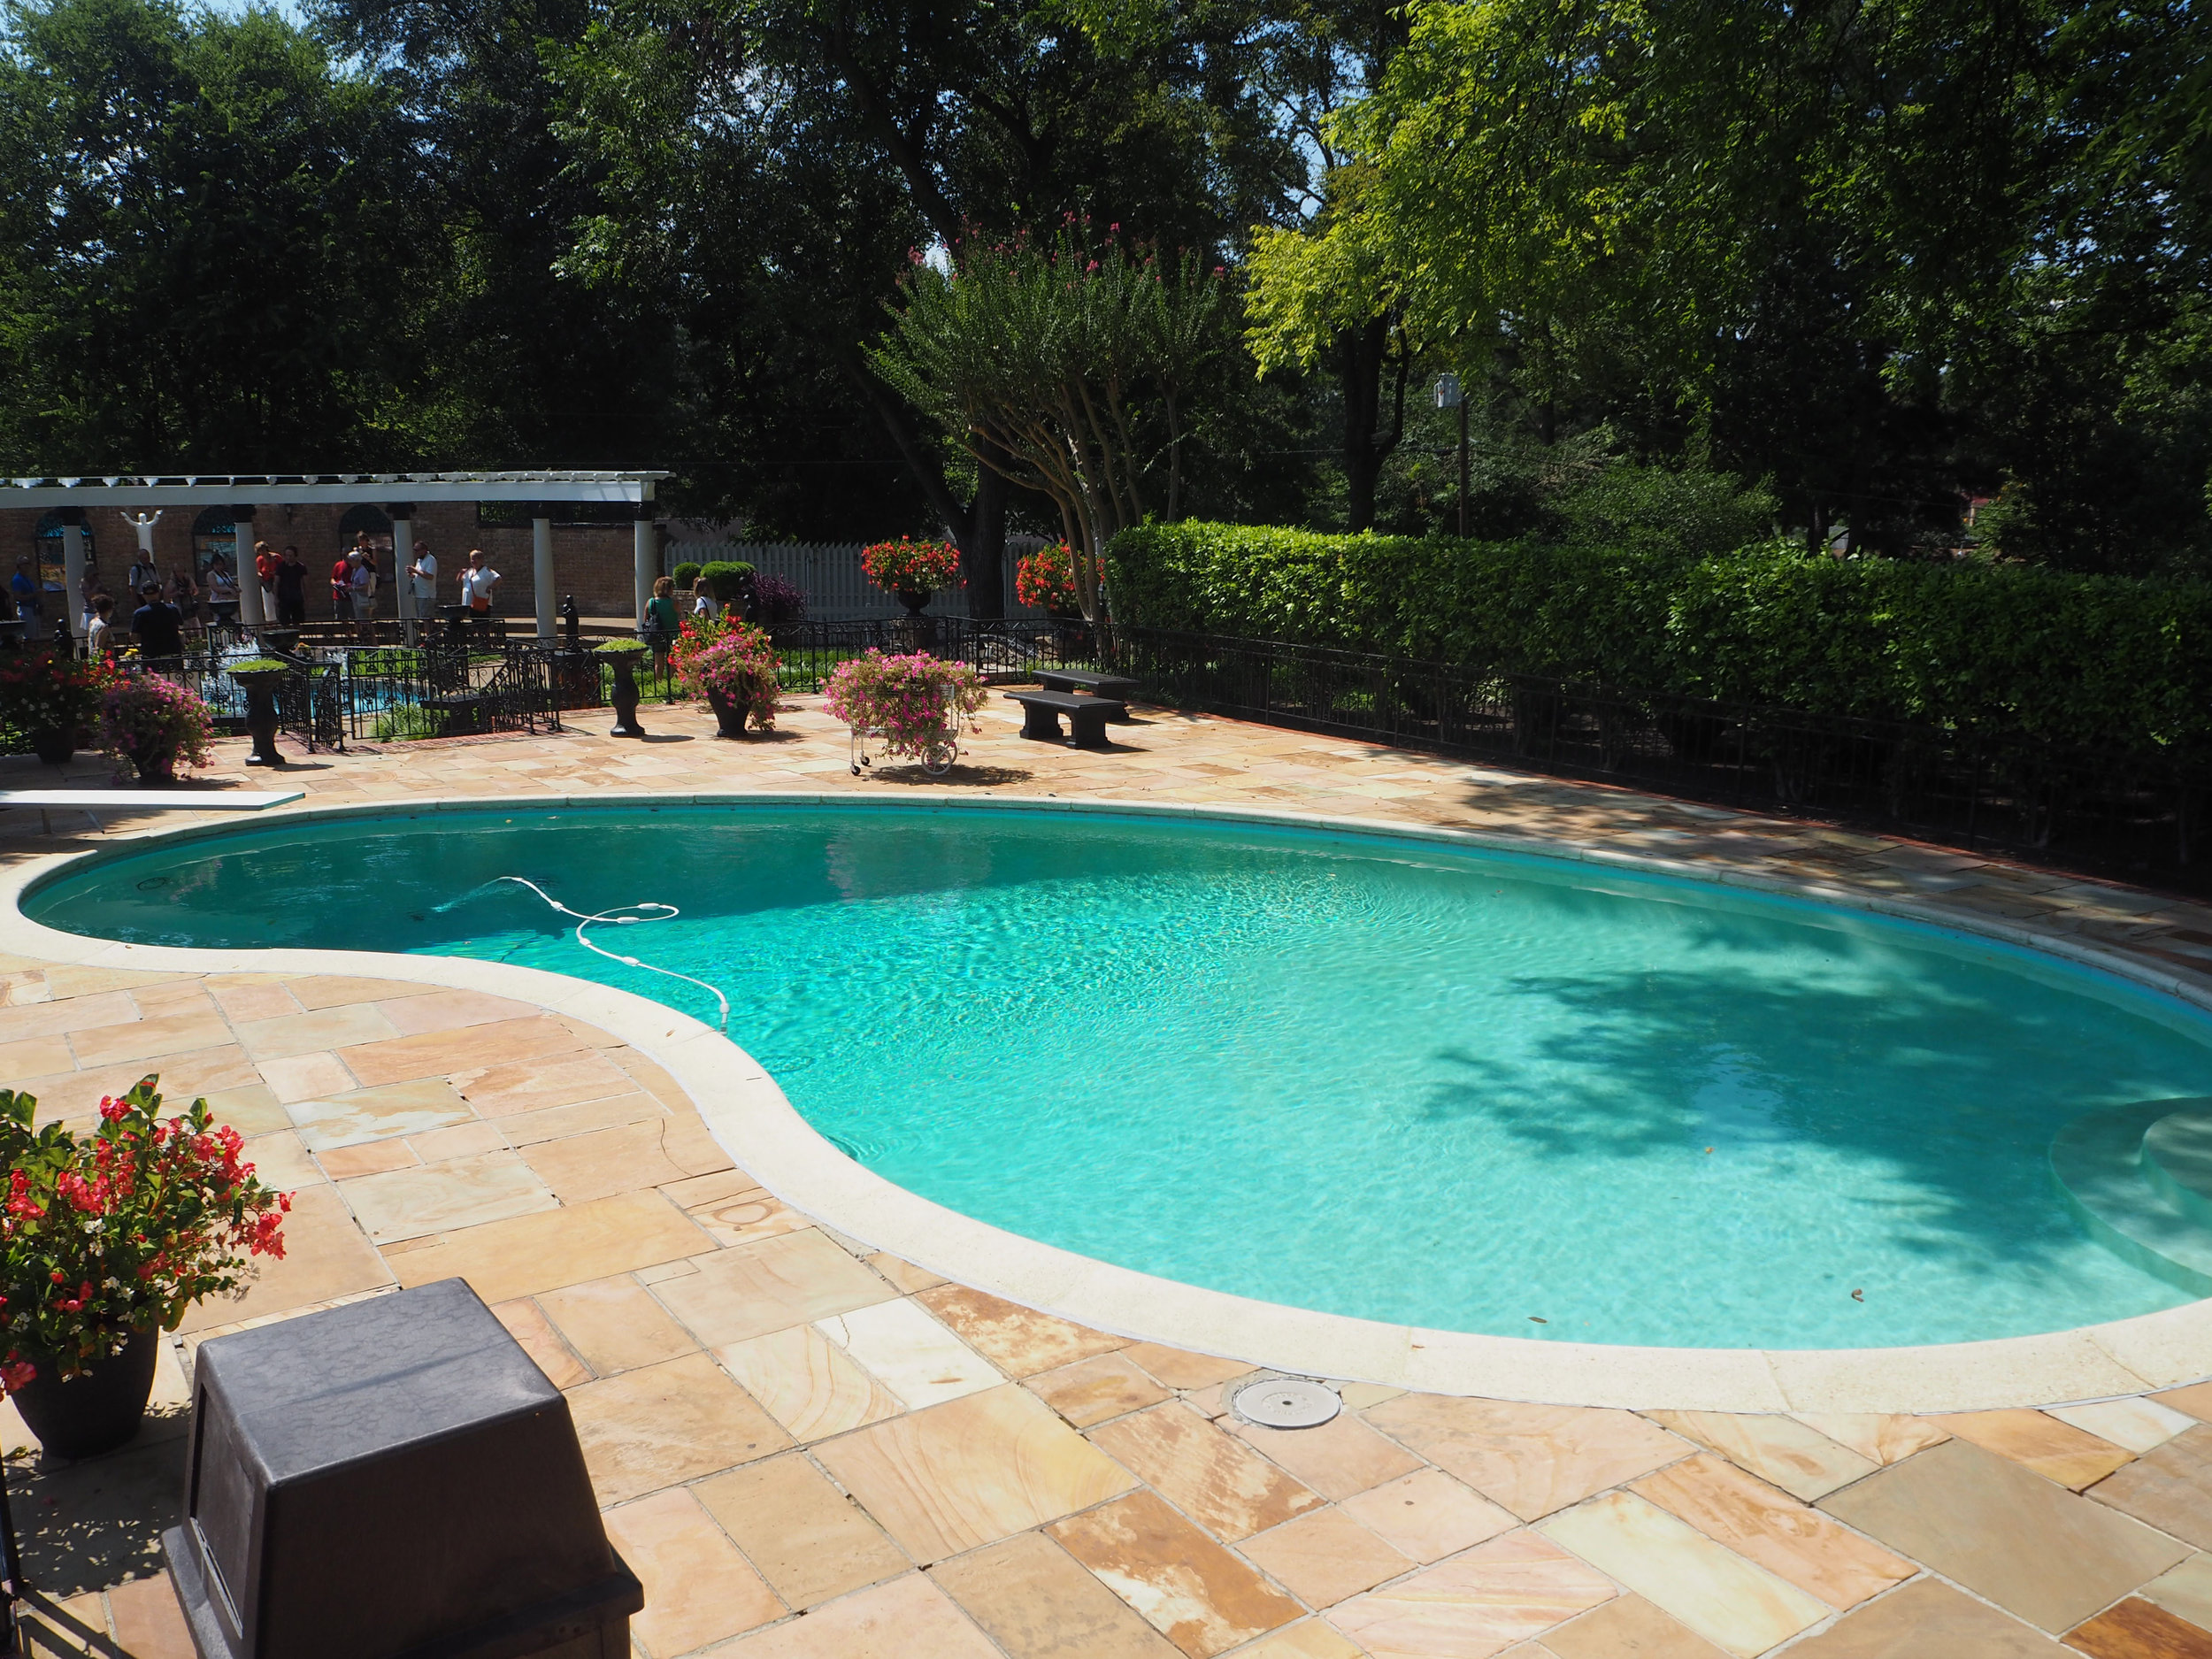 Elvis Presley | Graceland. The pool at Graceland. Click for more photos.